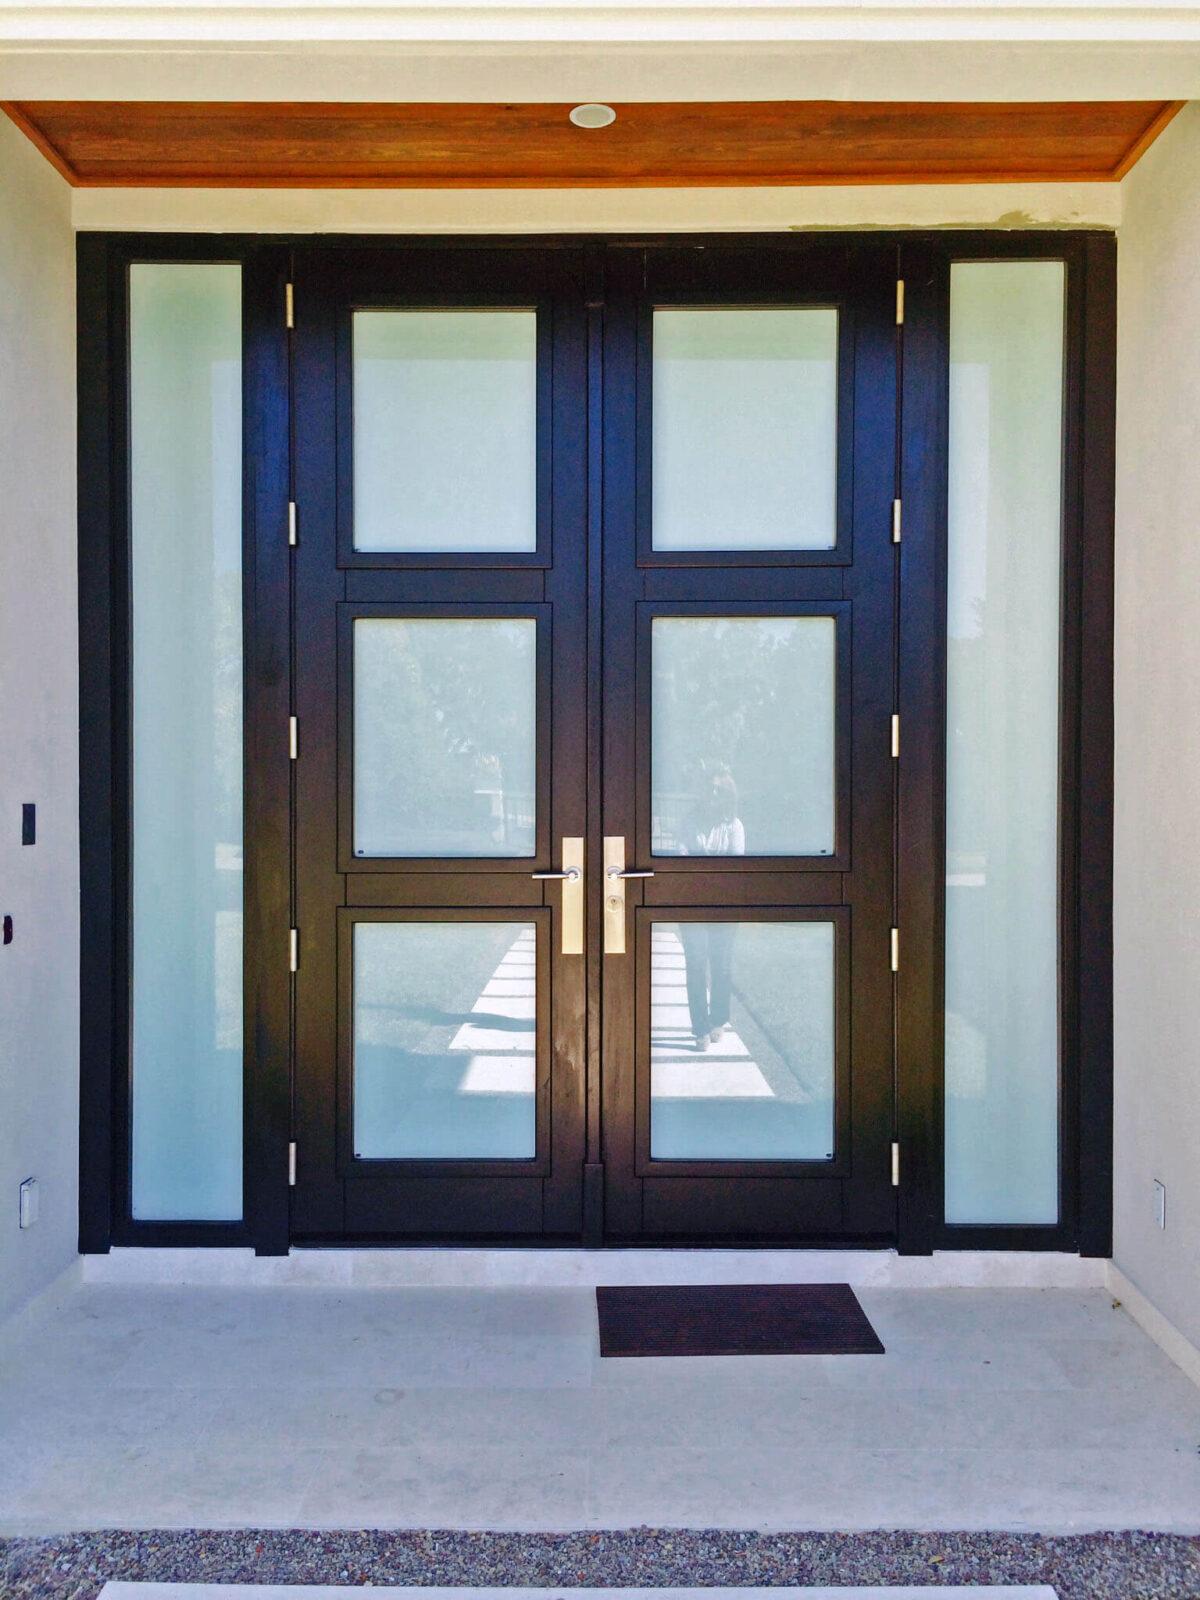 ORLANDO. MAHOGANY ENTRANCE GLASS DOOR.